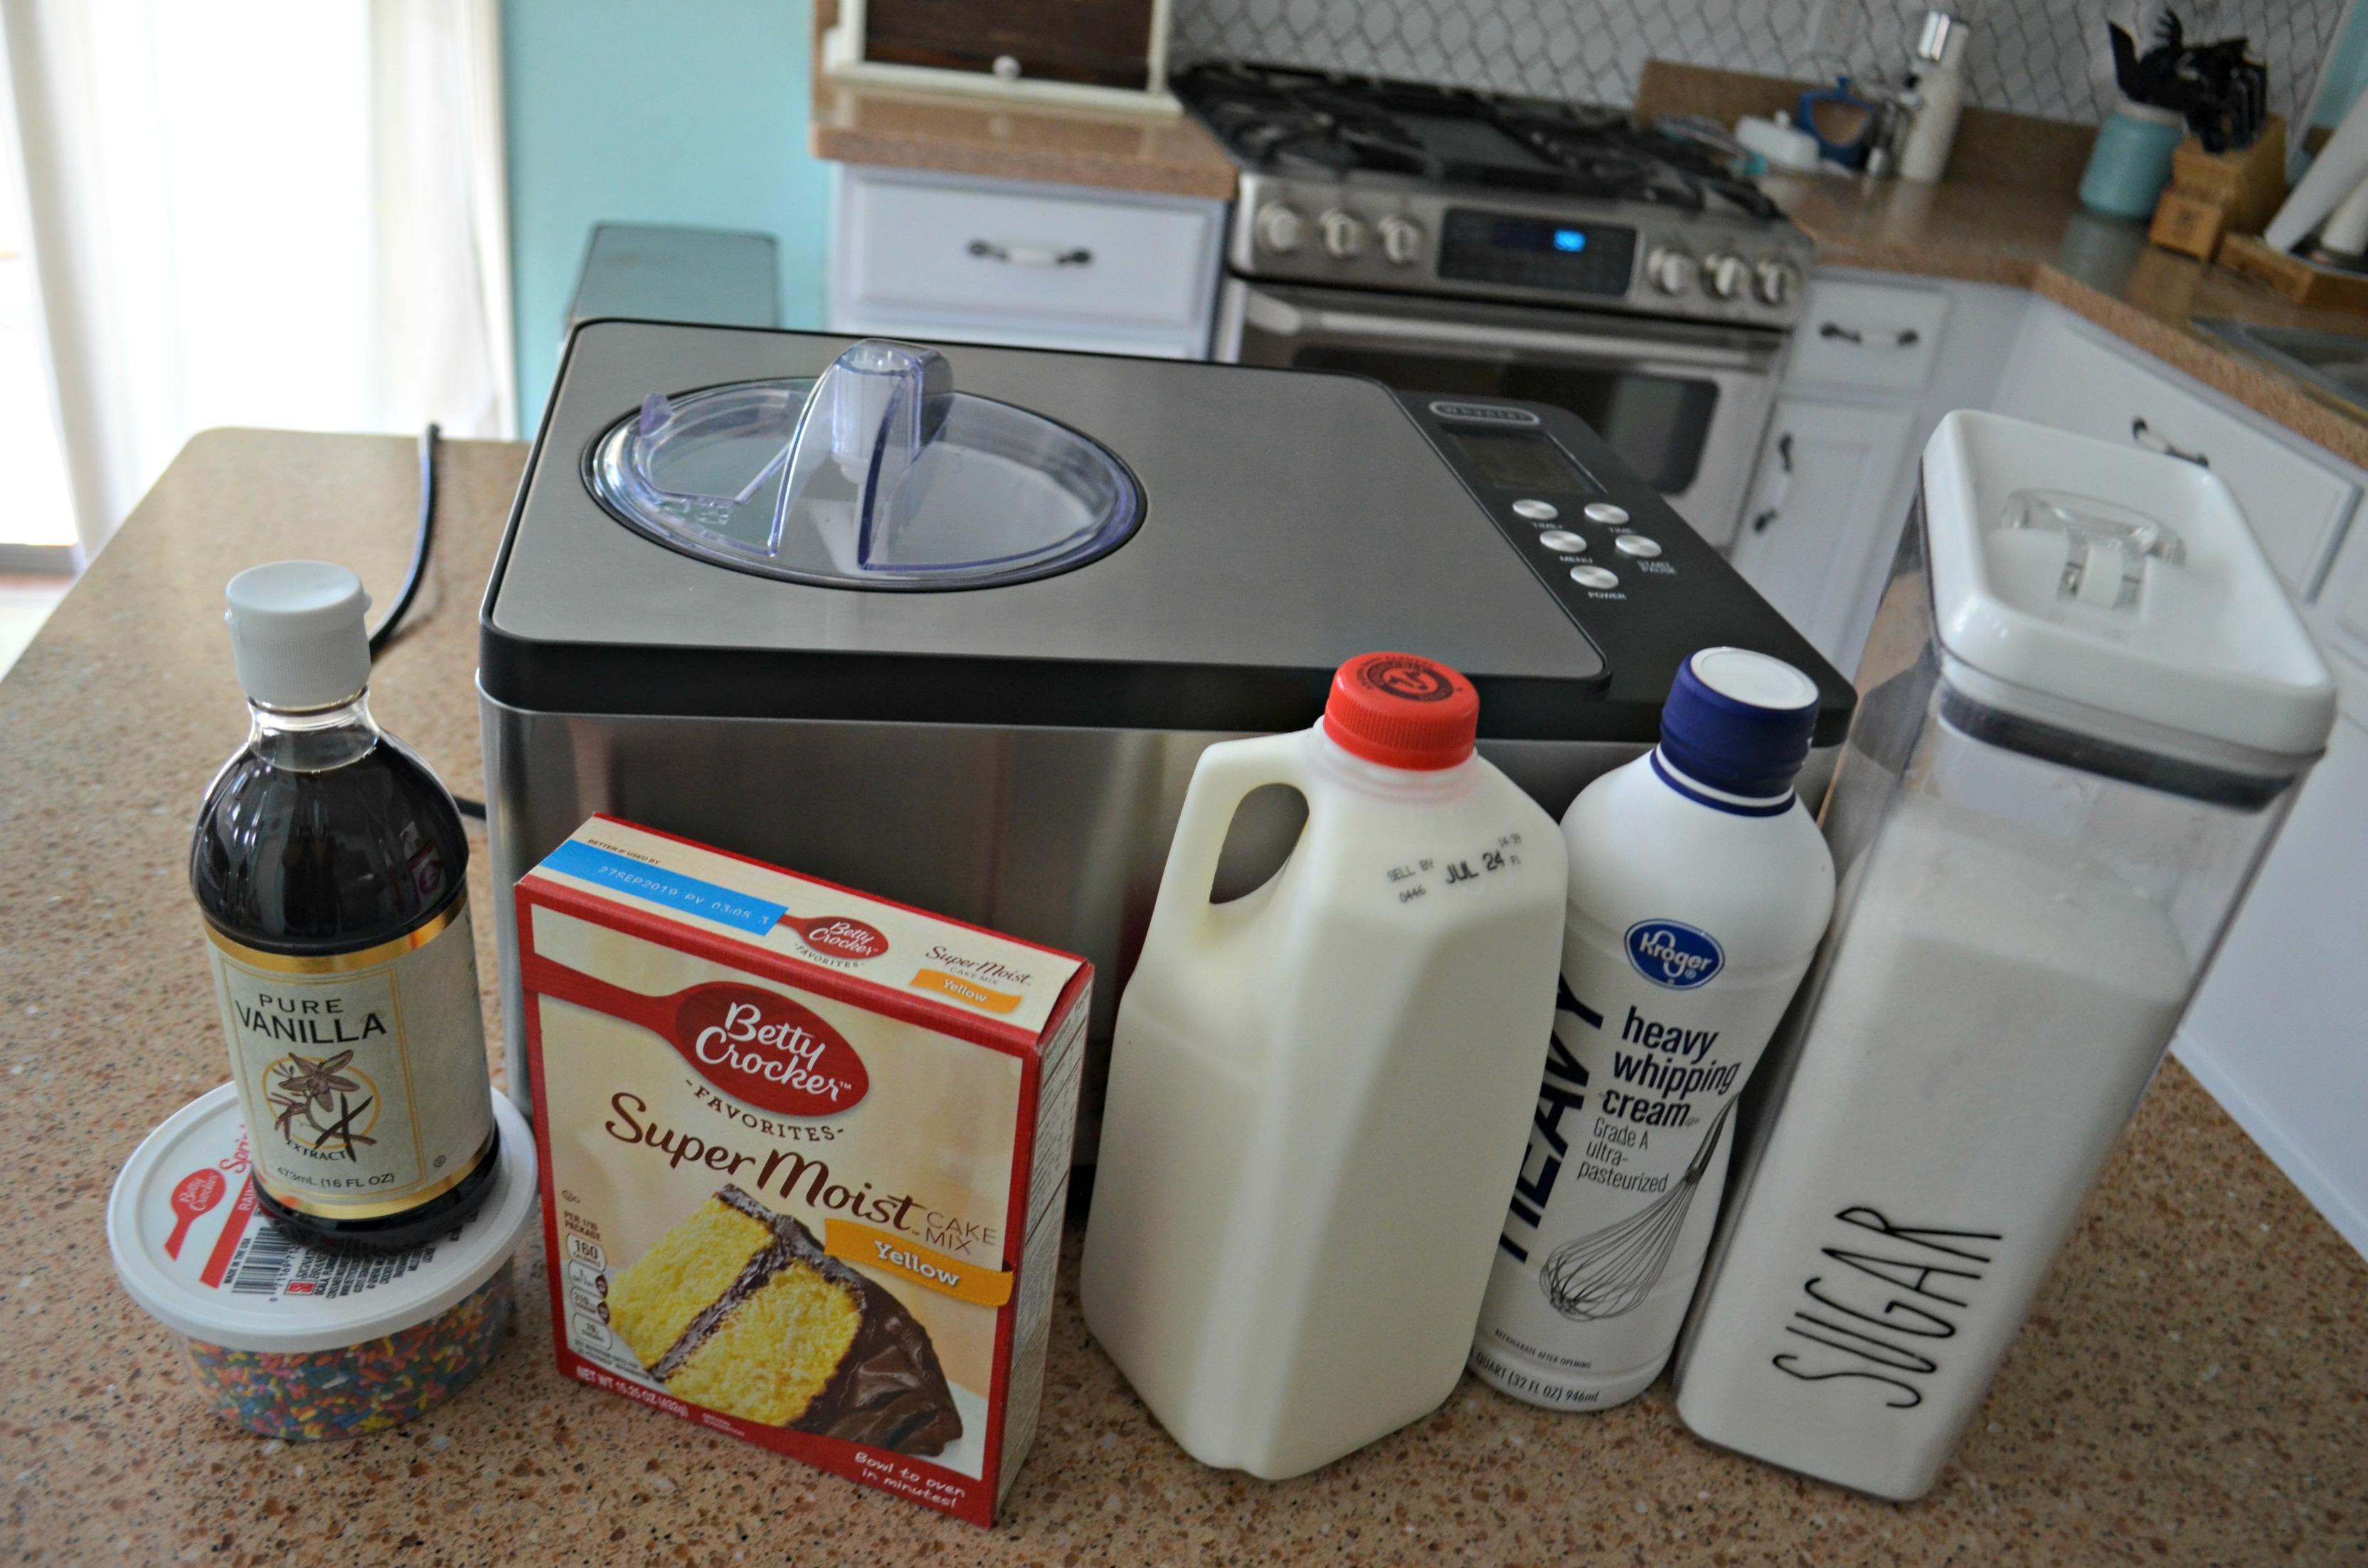 homemade cake batter ice cream – ingredients and ice cream maker